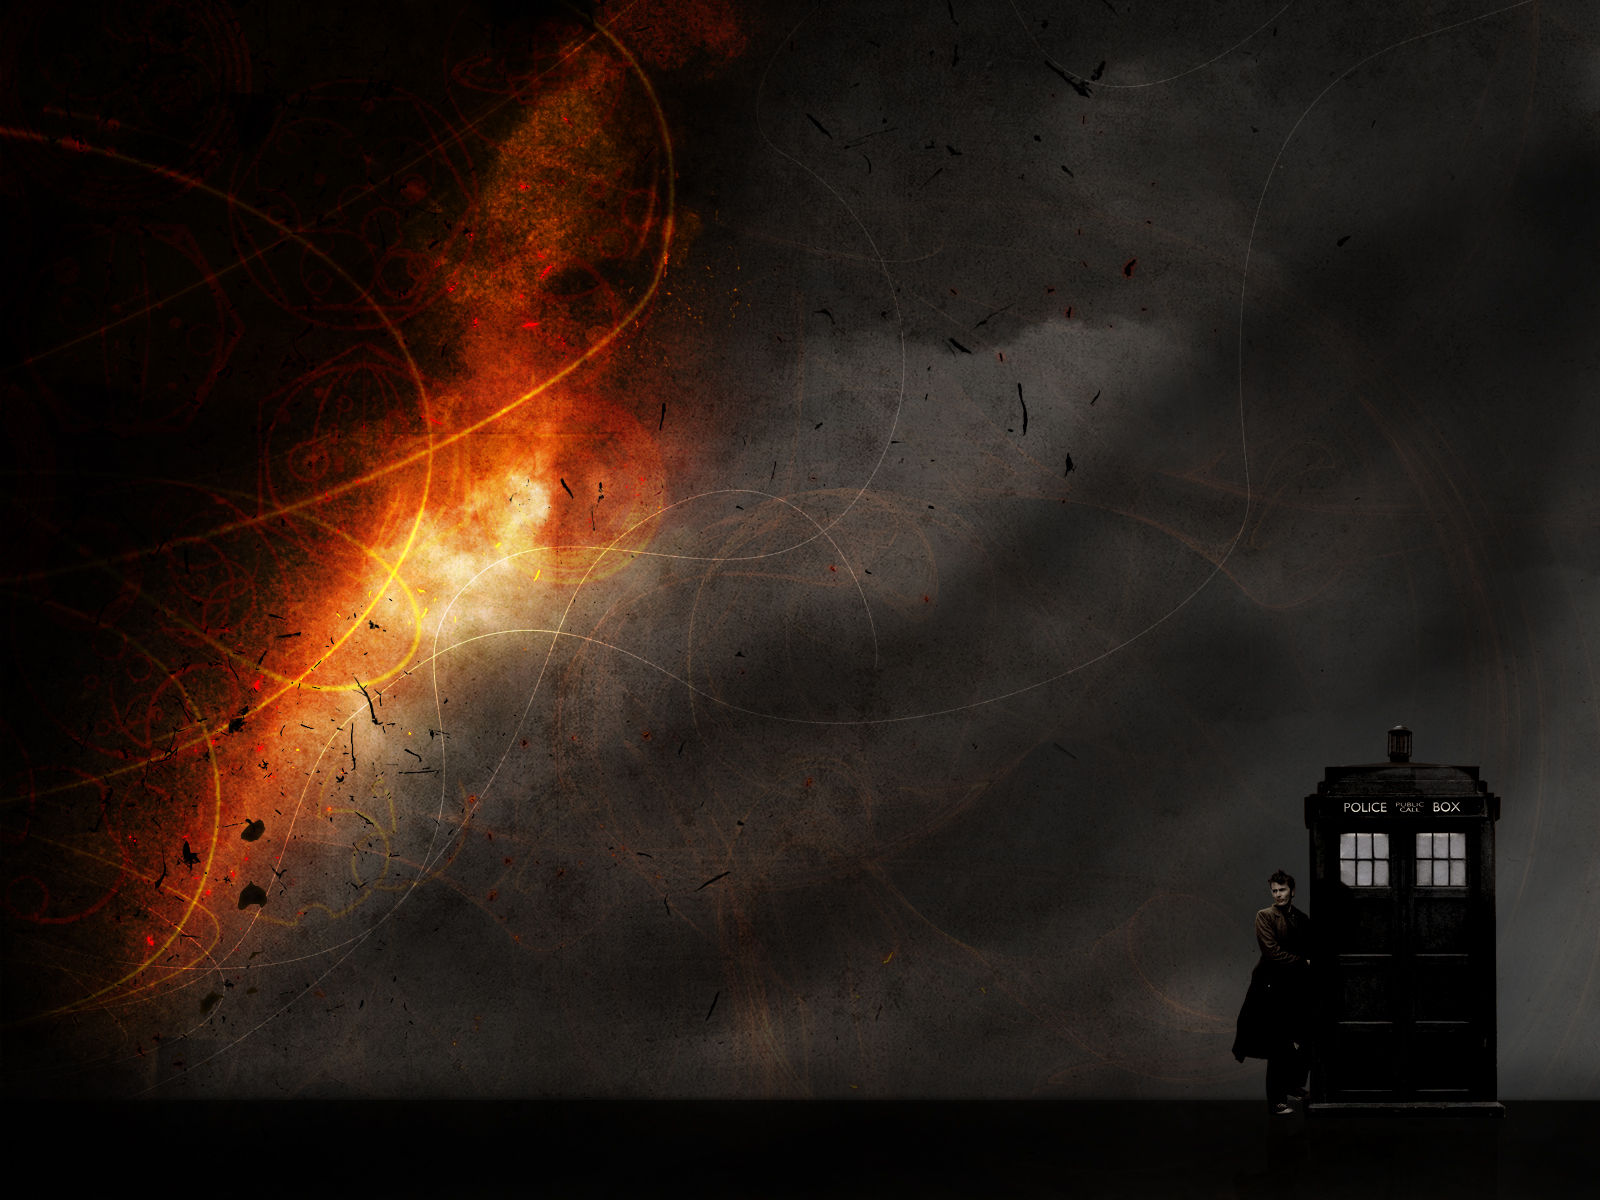 Doctor Who Tardis Screensaver